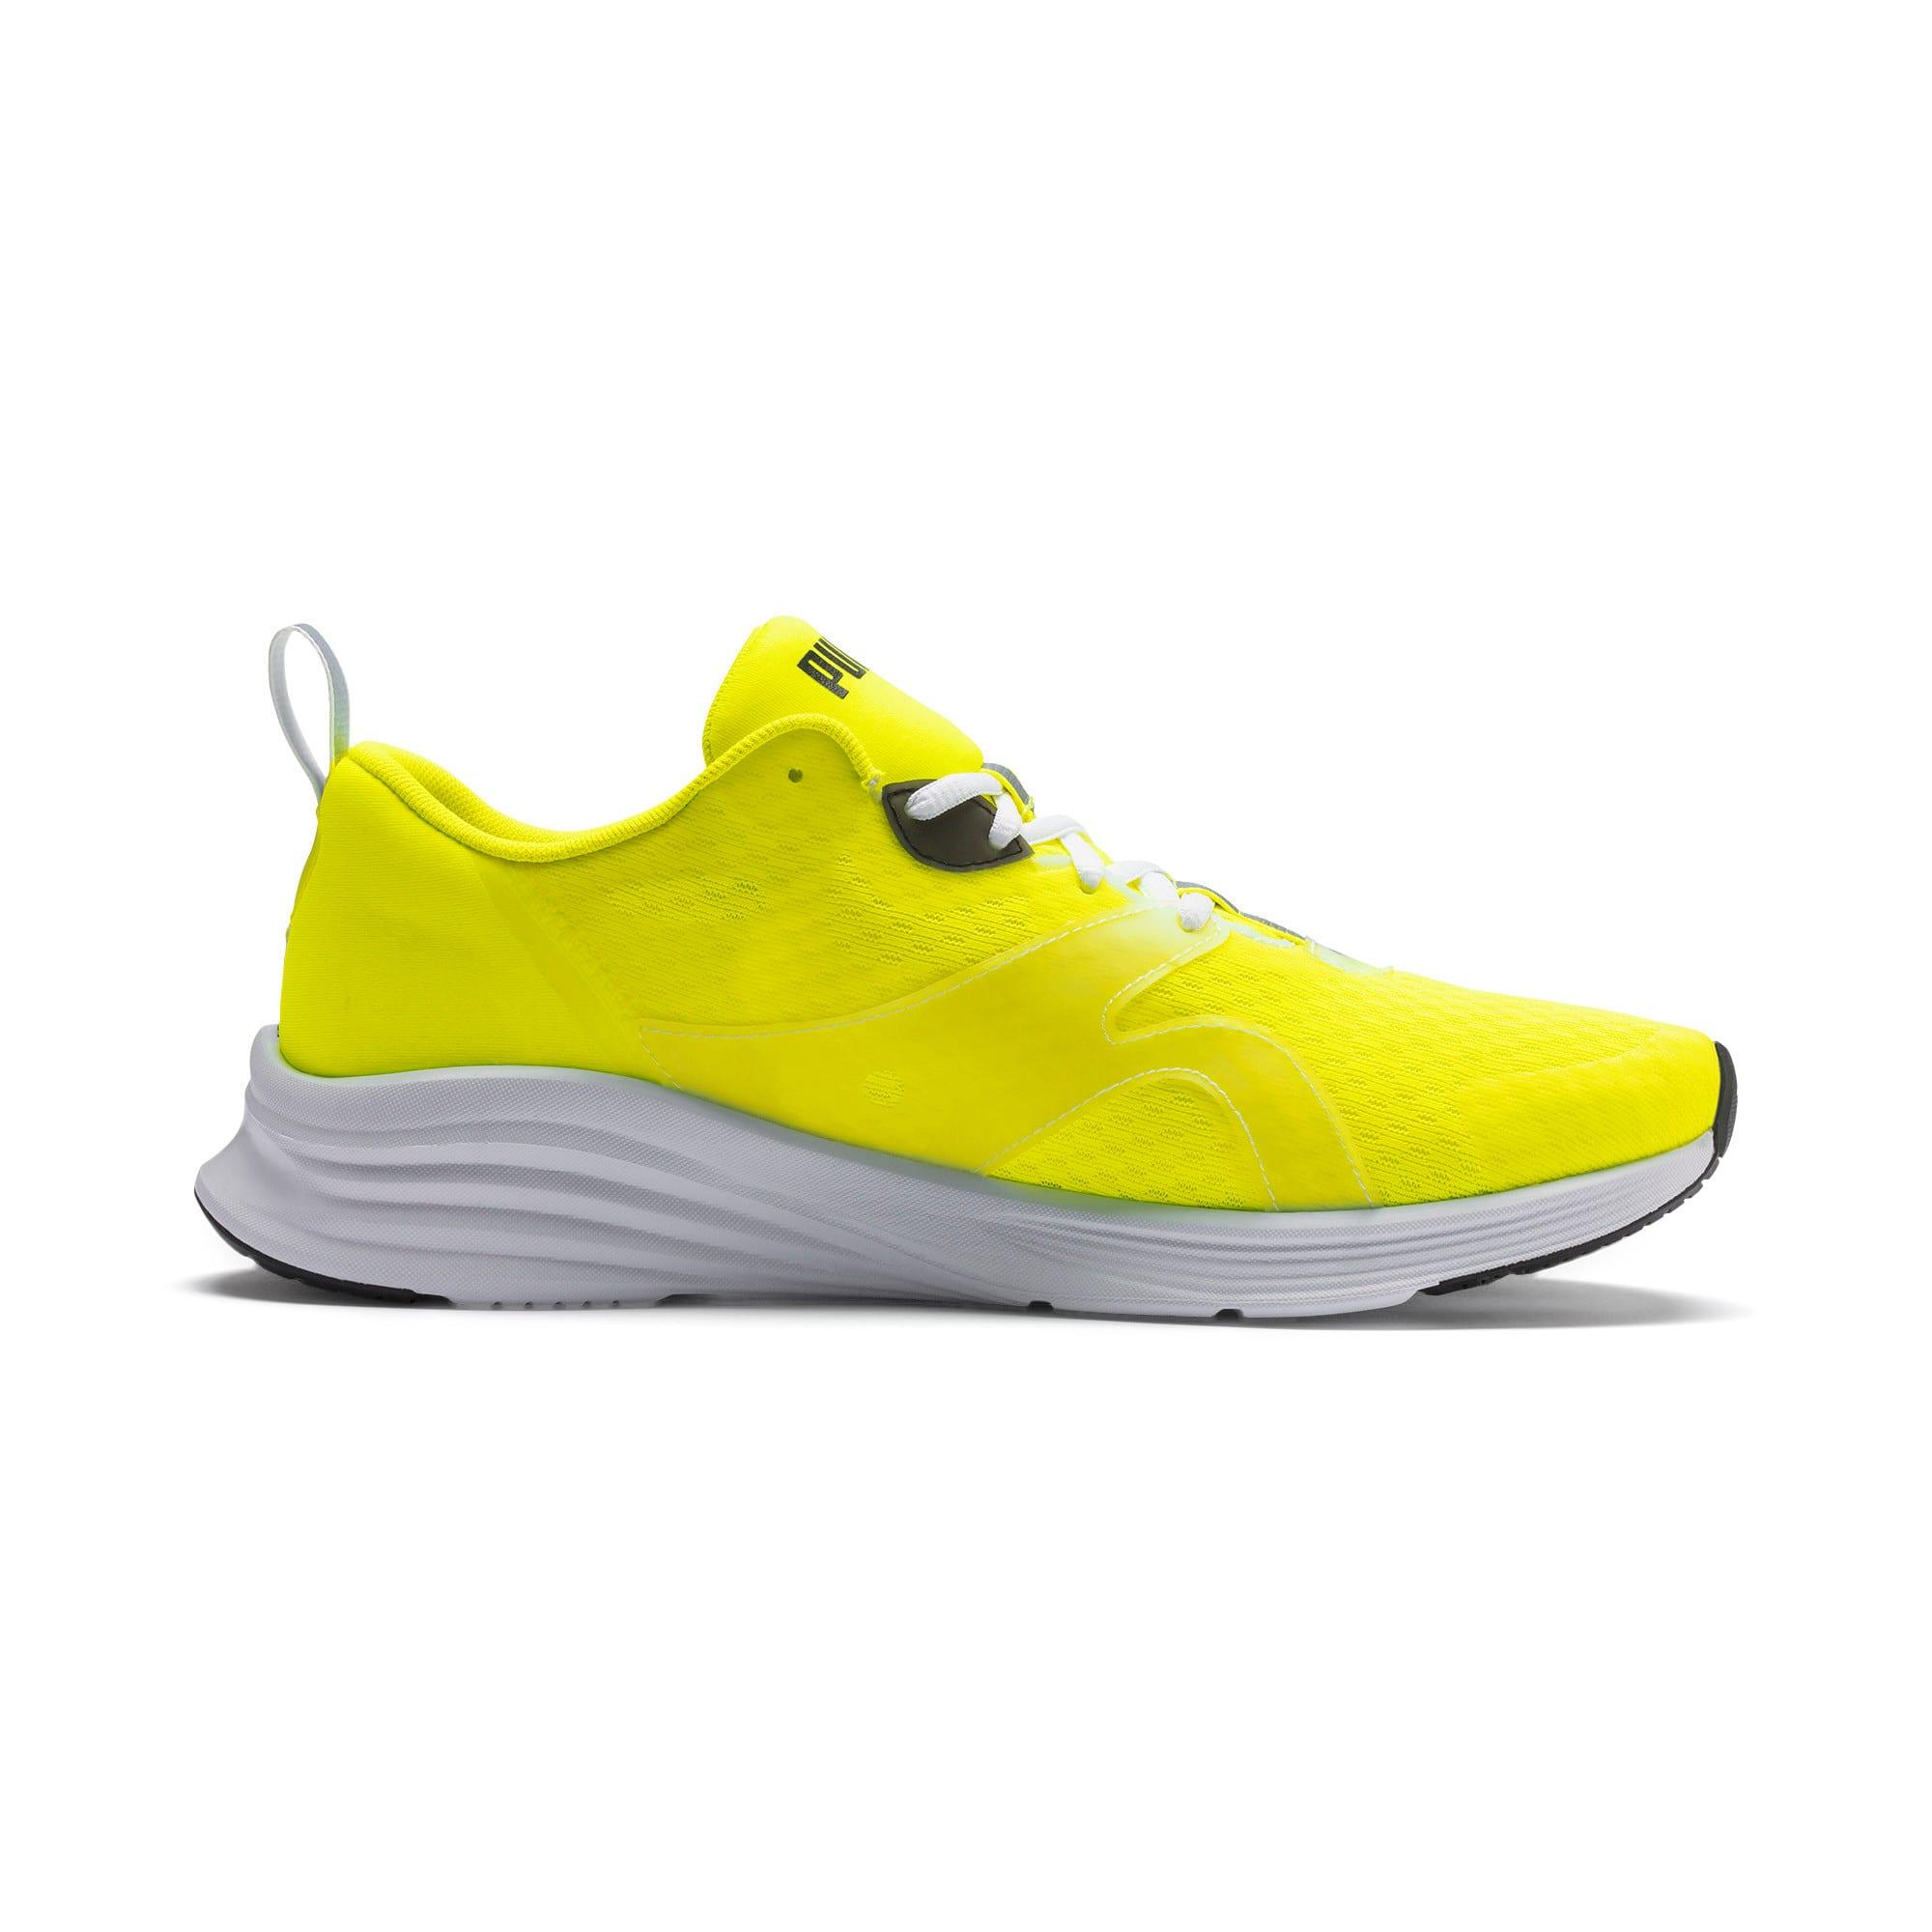 Thumbnail 6 of HYBRID Fuego Lights Men's Running Shoes, Yellow Alert, medium